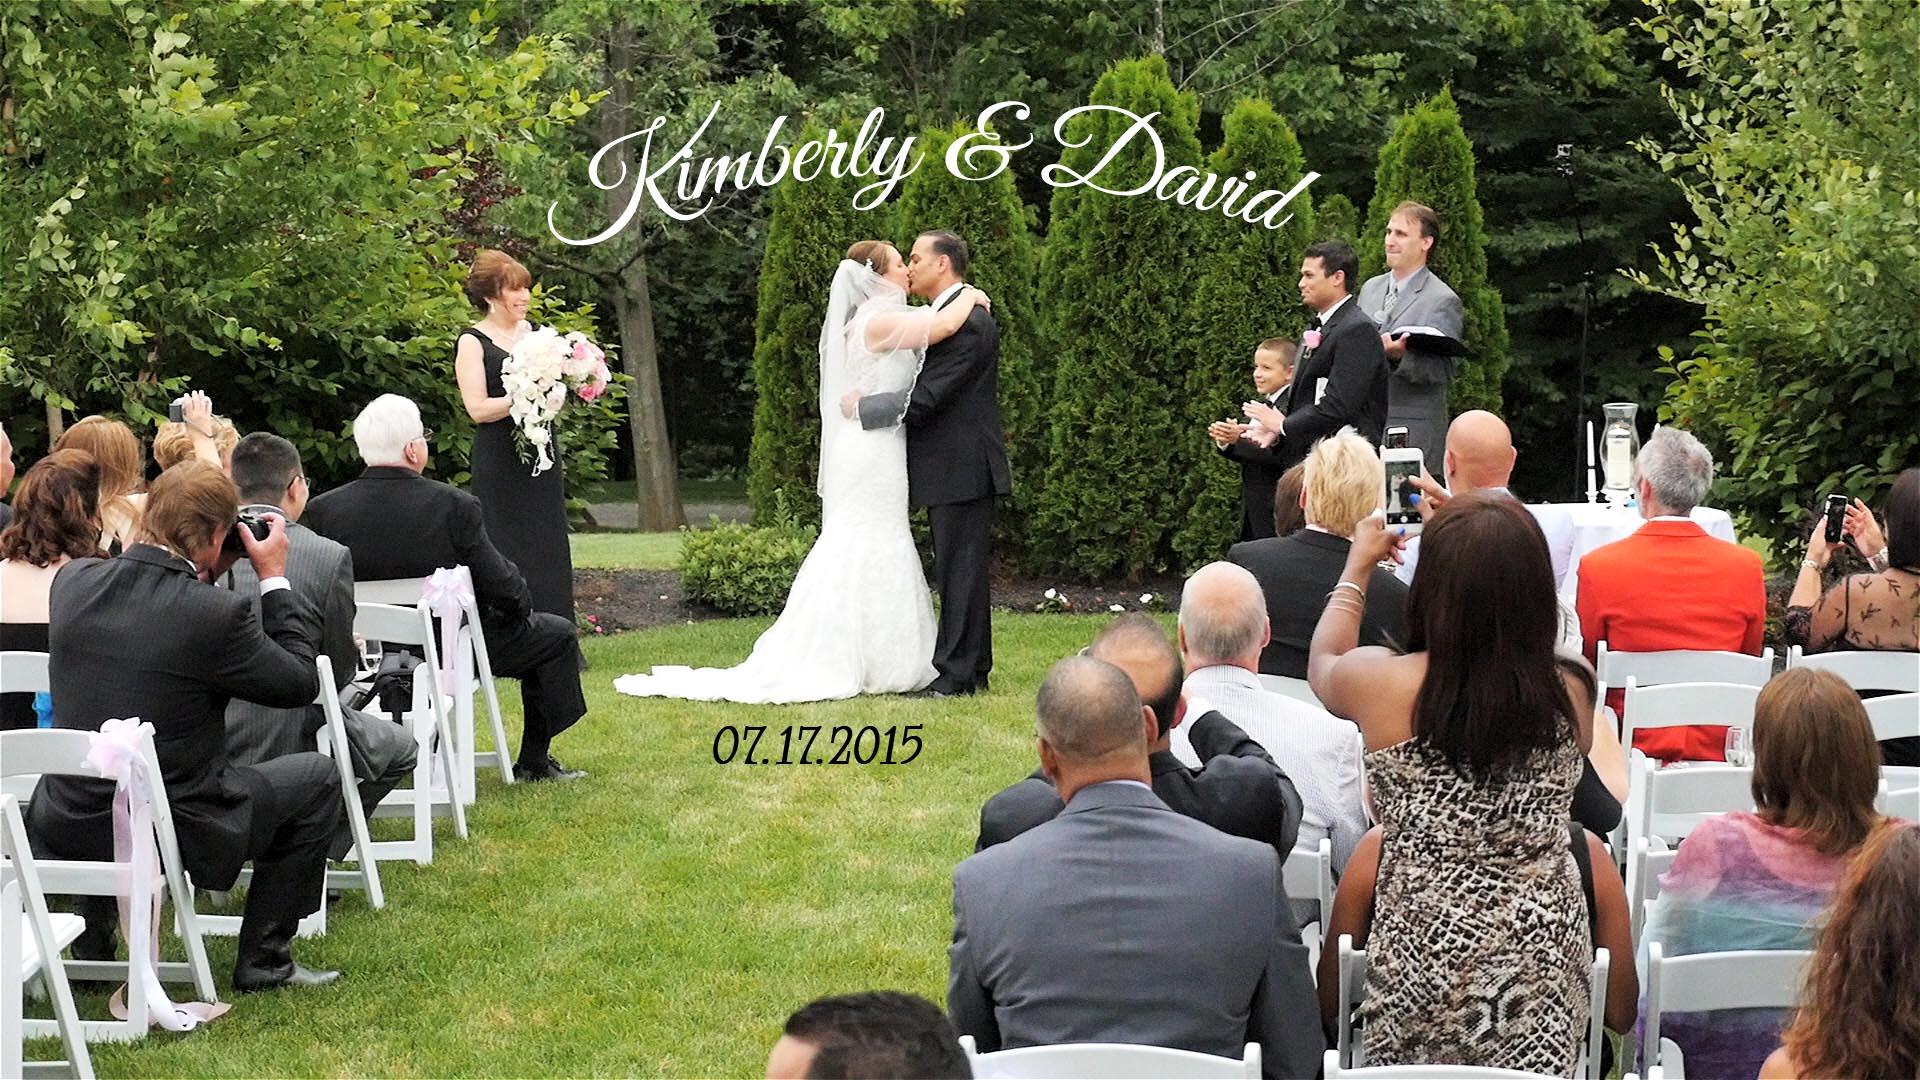 Kimberly & David – Avanti Mansion Buffalo